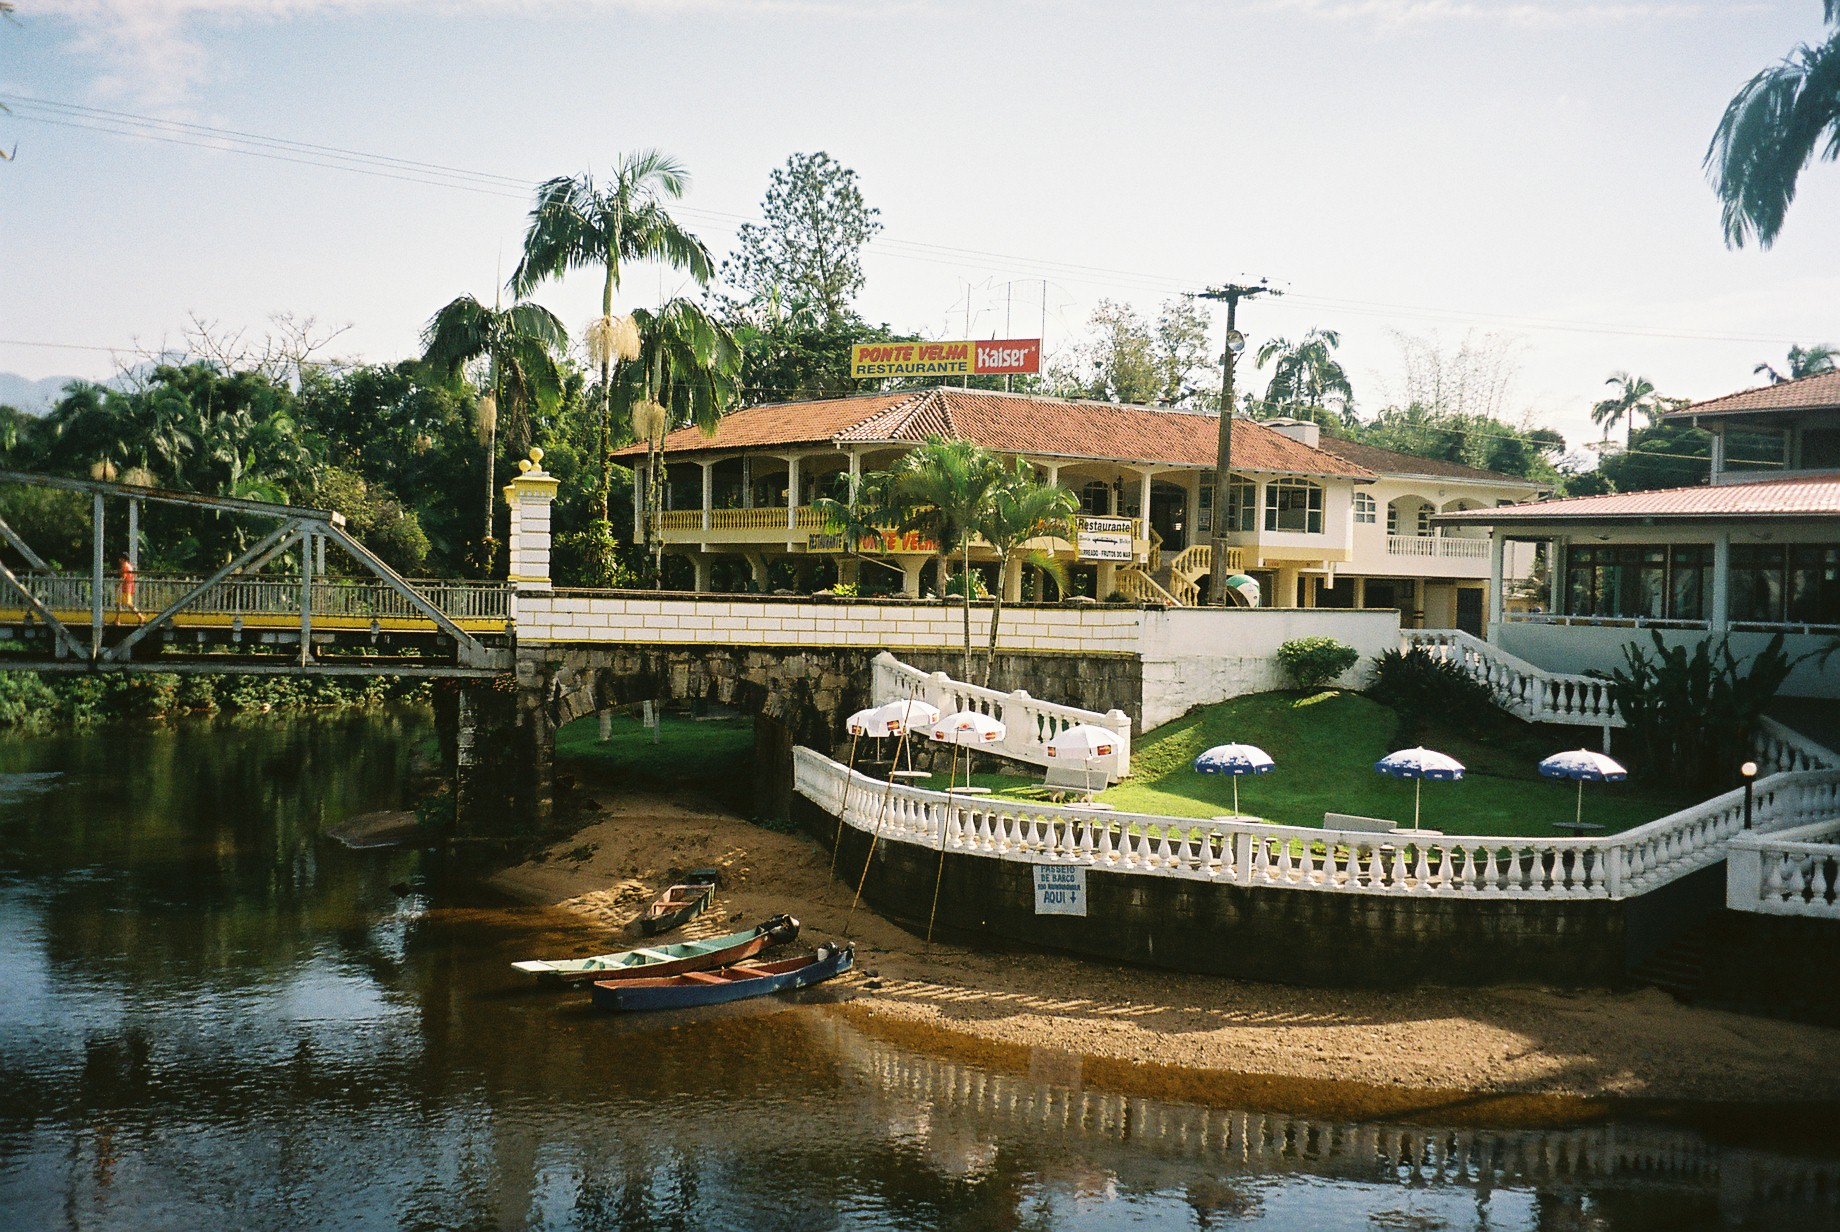 morretes-pnte-velha-restaurant-on-the-river-nundam-ate-there-2008